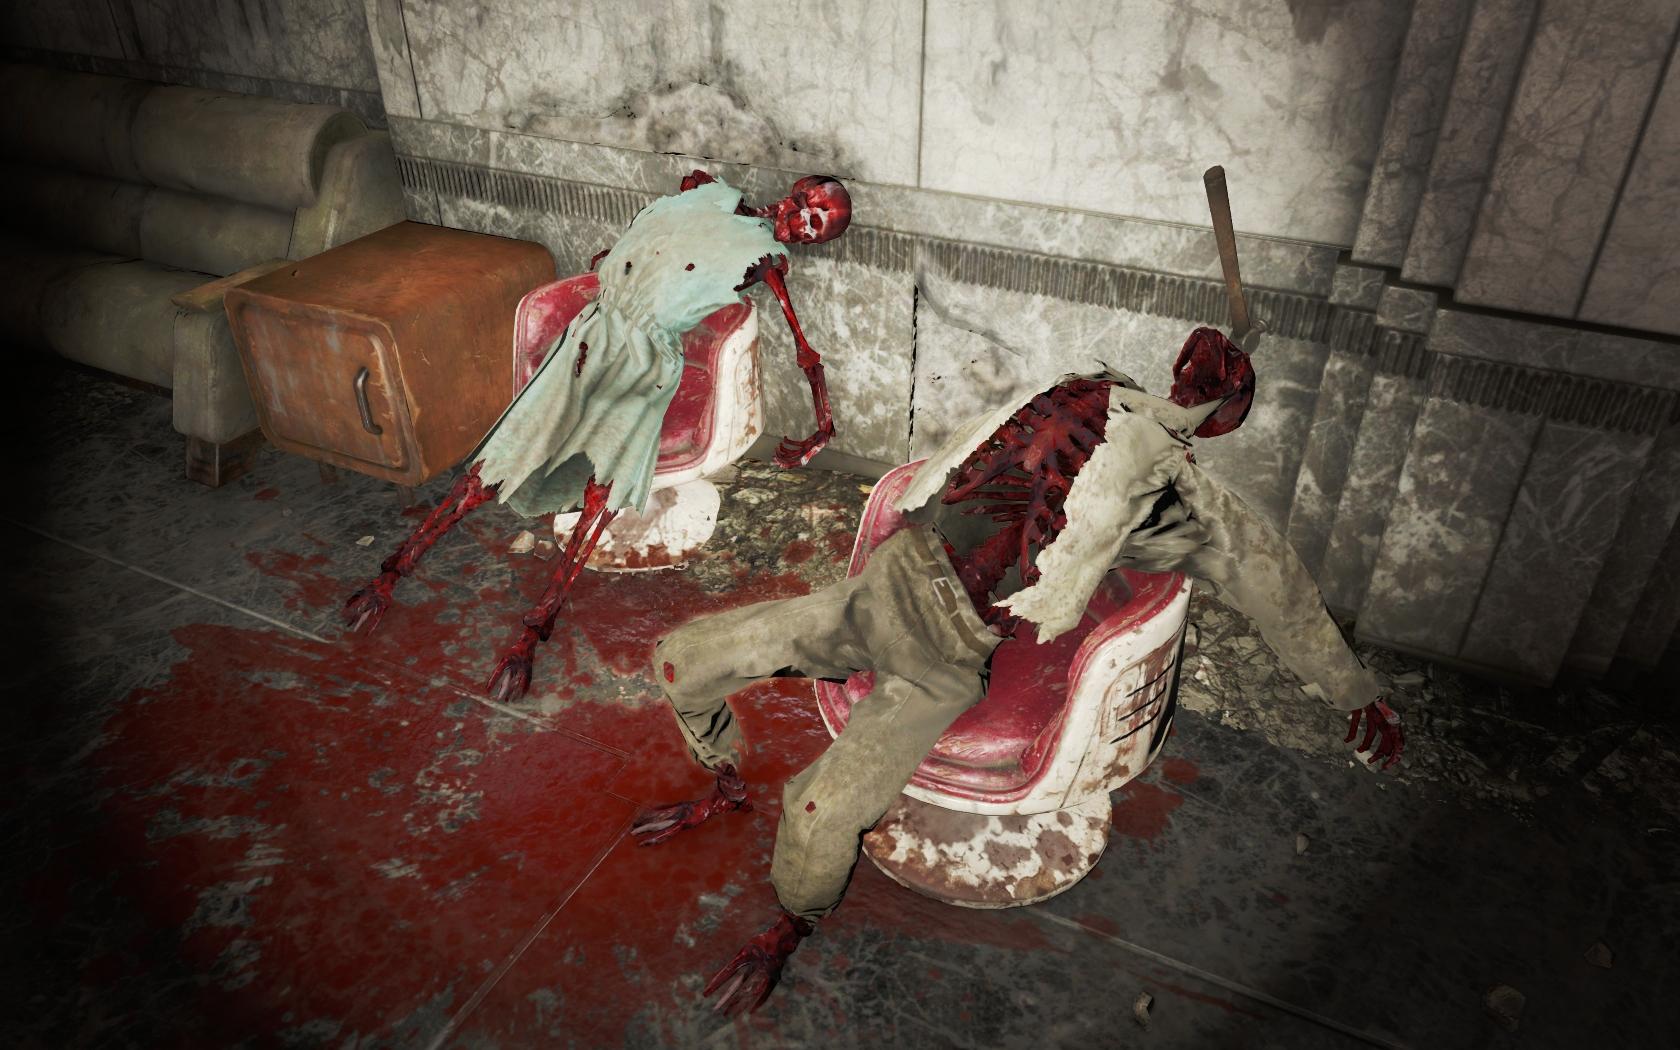 Зверское убийство молотком (Фар-Харбор, Фабрика лимонада Вим!) v2 - Fallout 4 скелет